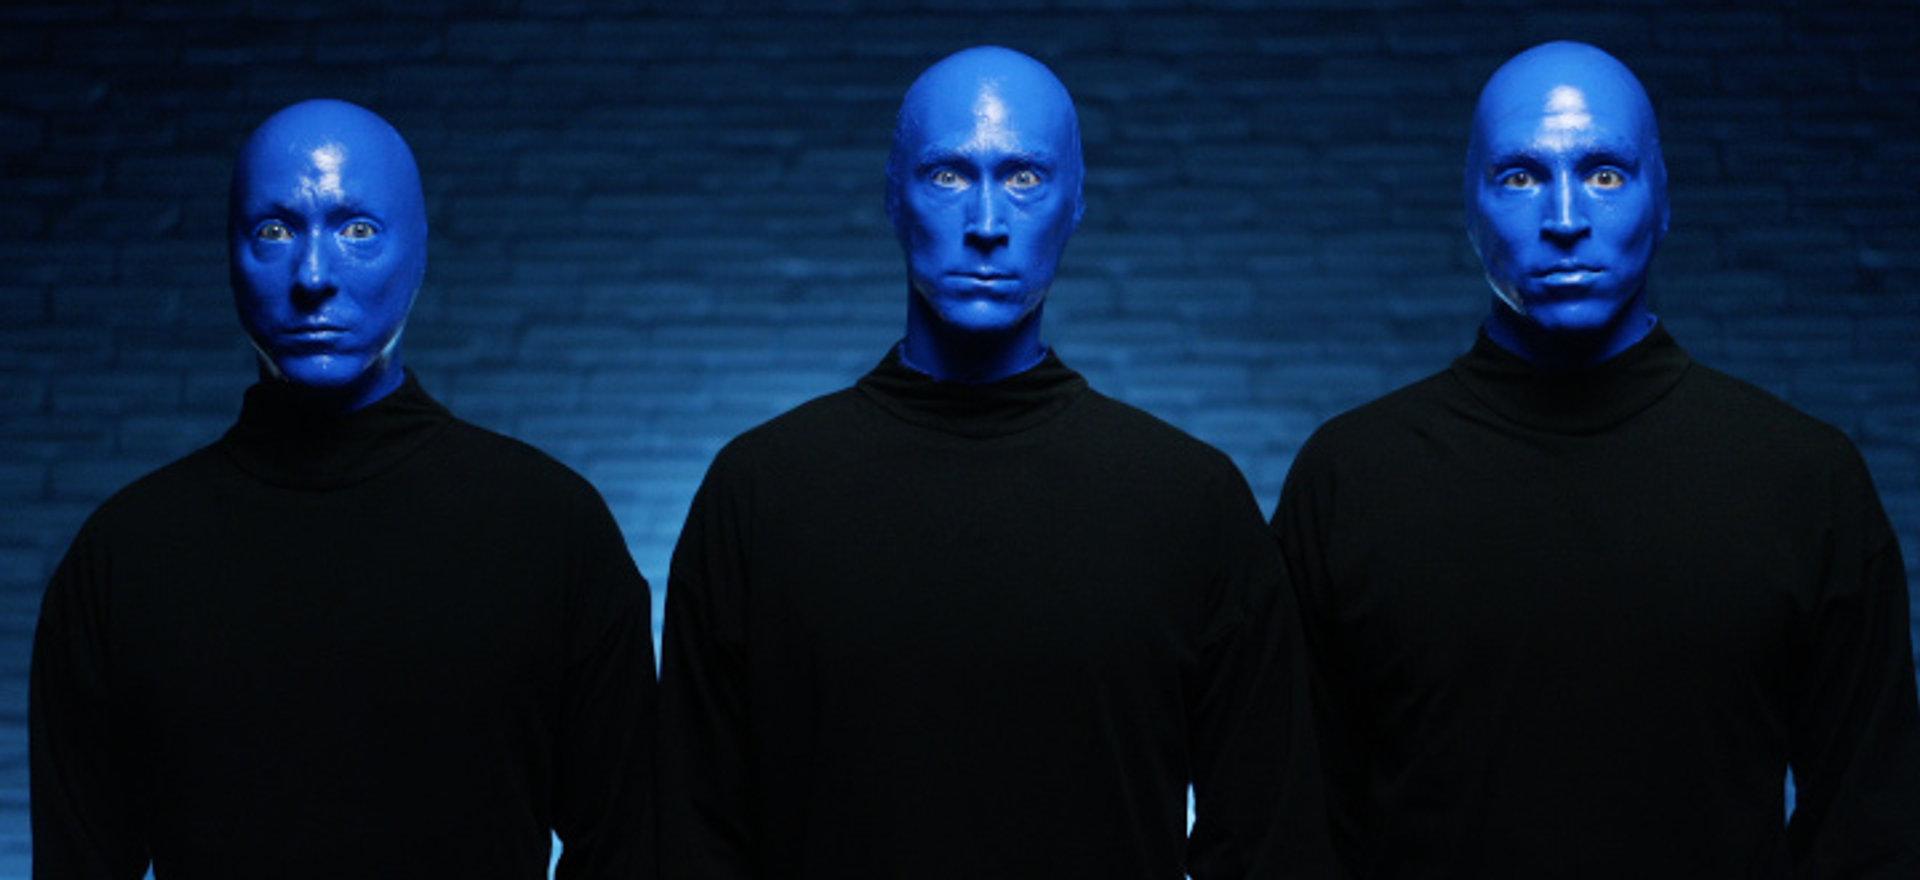 Blue Man Group - Showcase Video